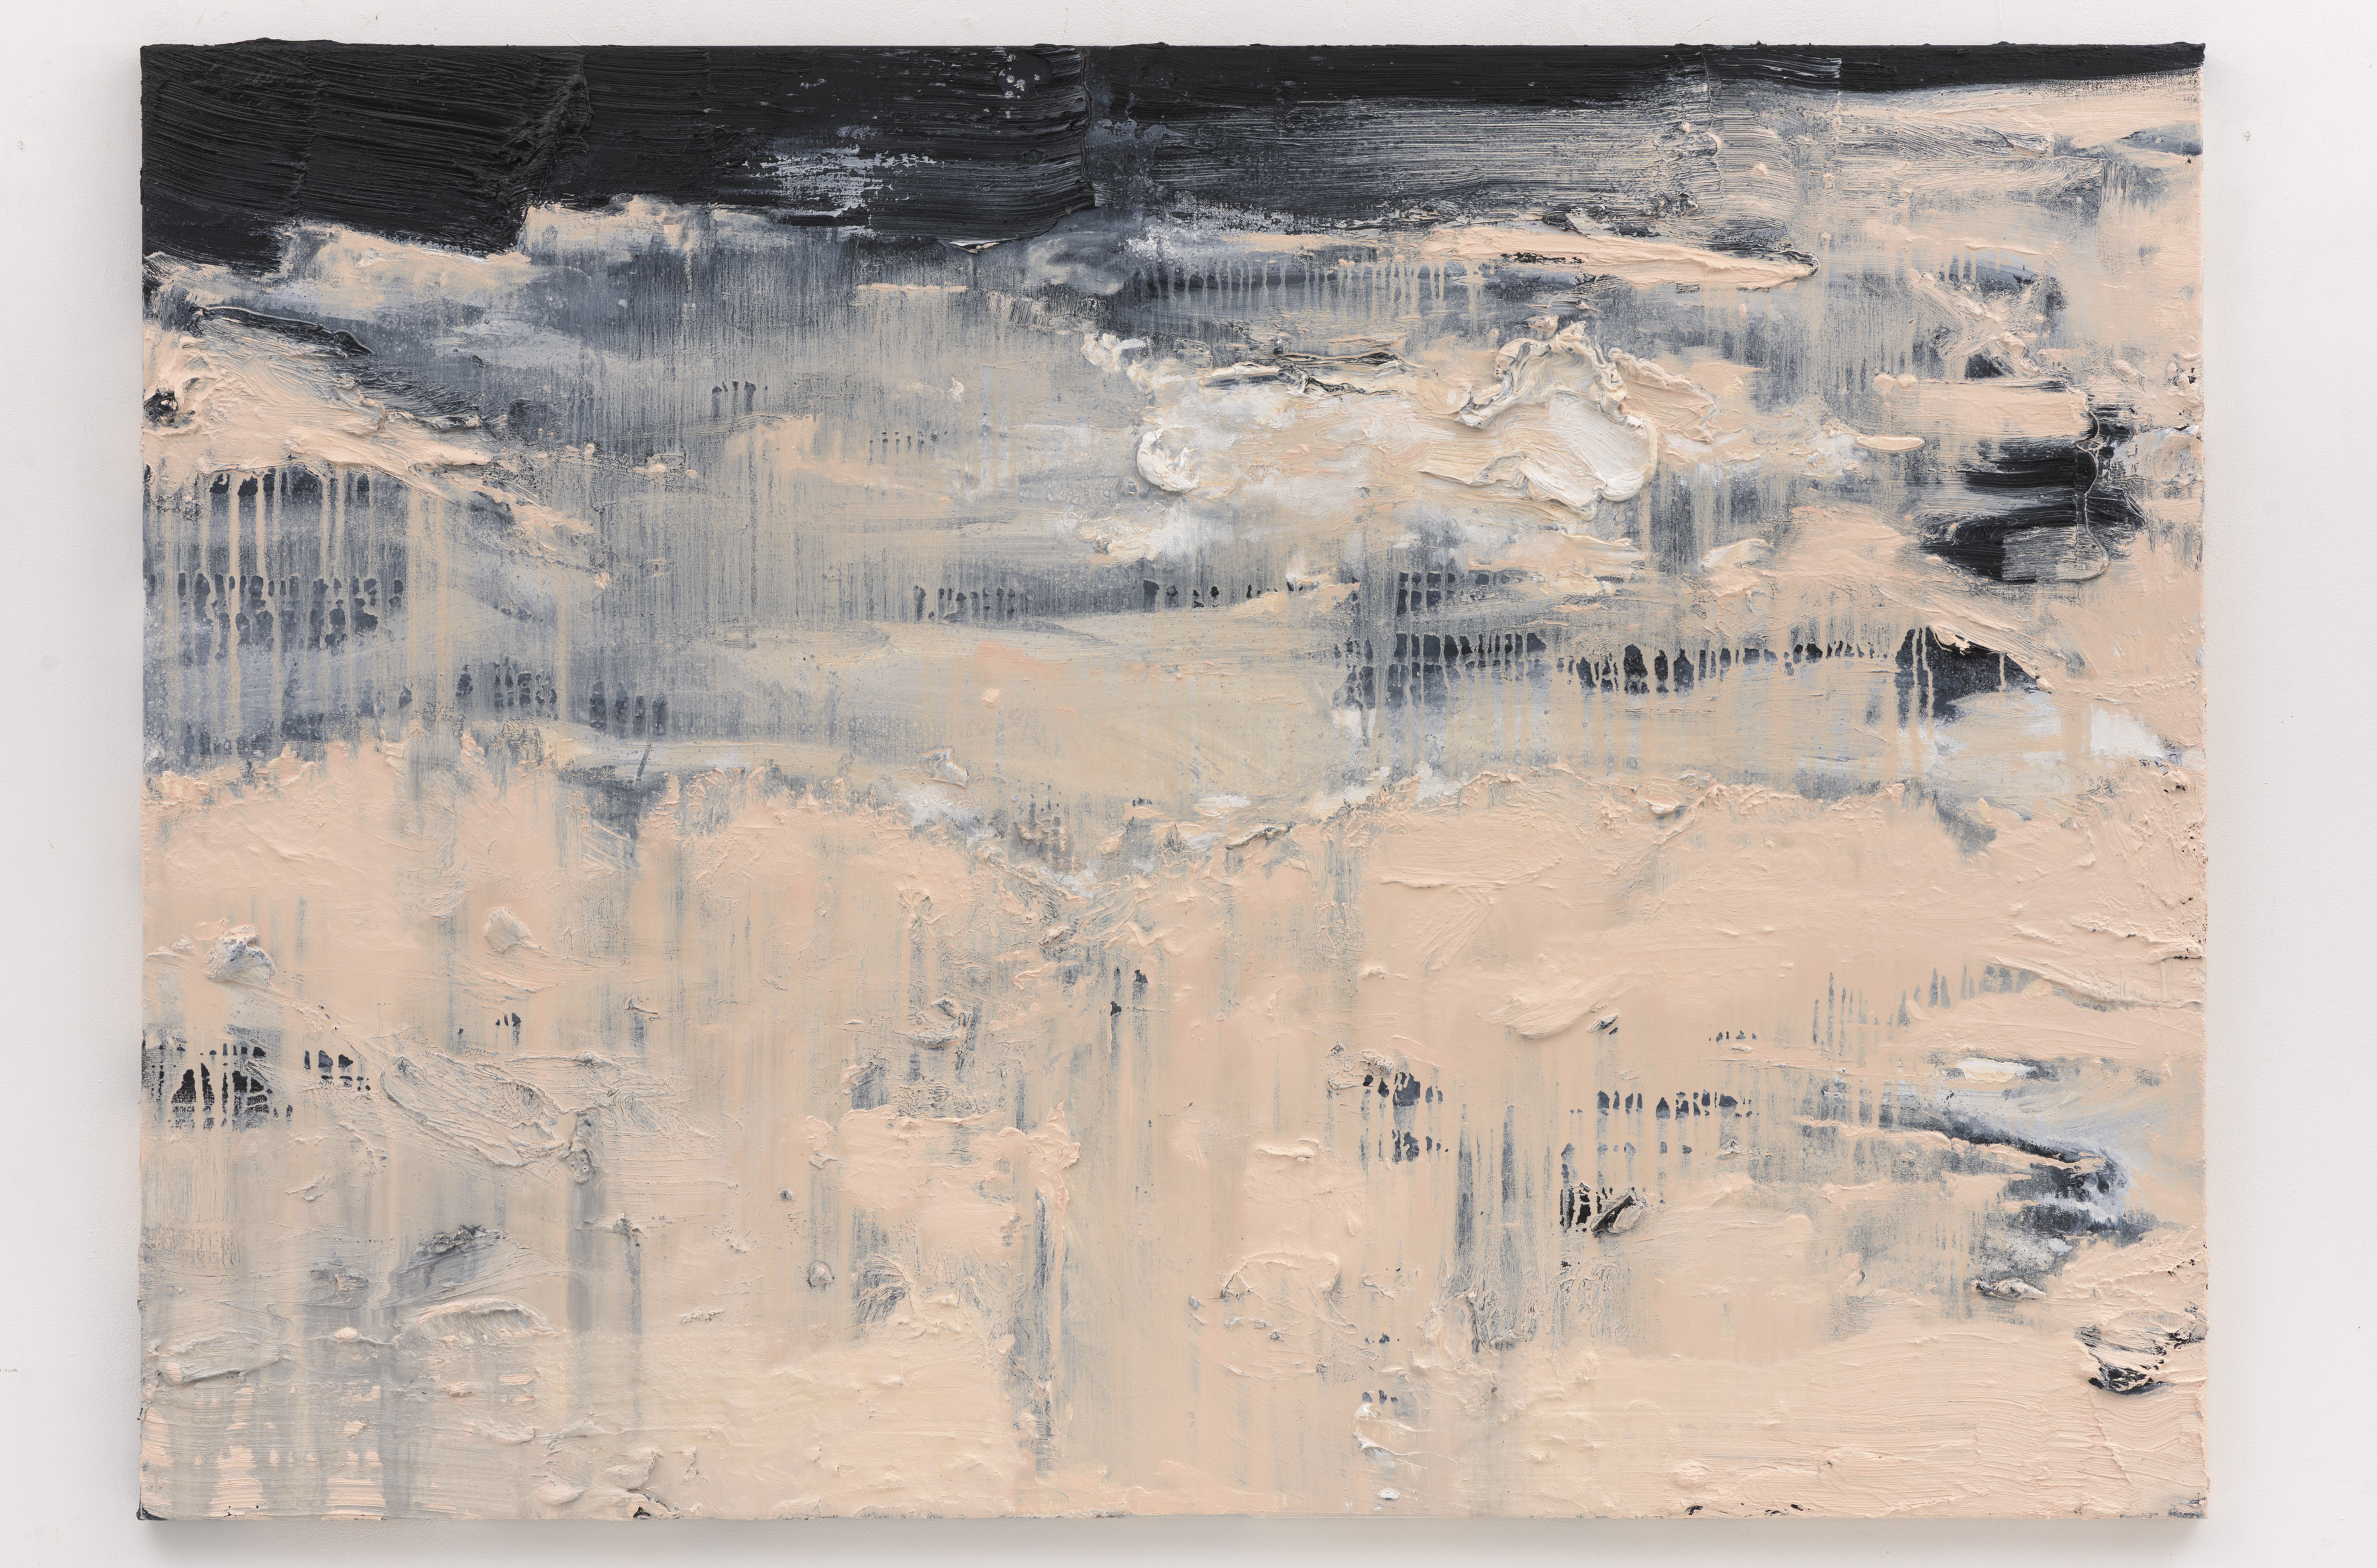 """Nebuloso"" 100 x 140 cm. oil on linen 2017"